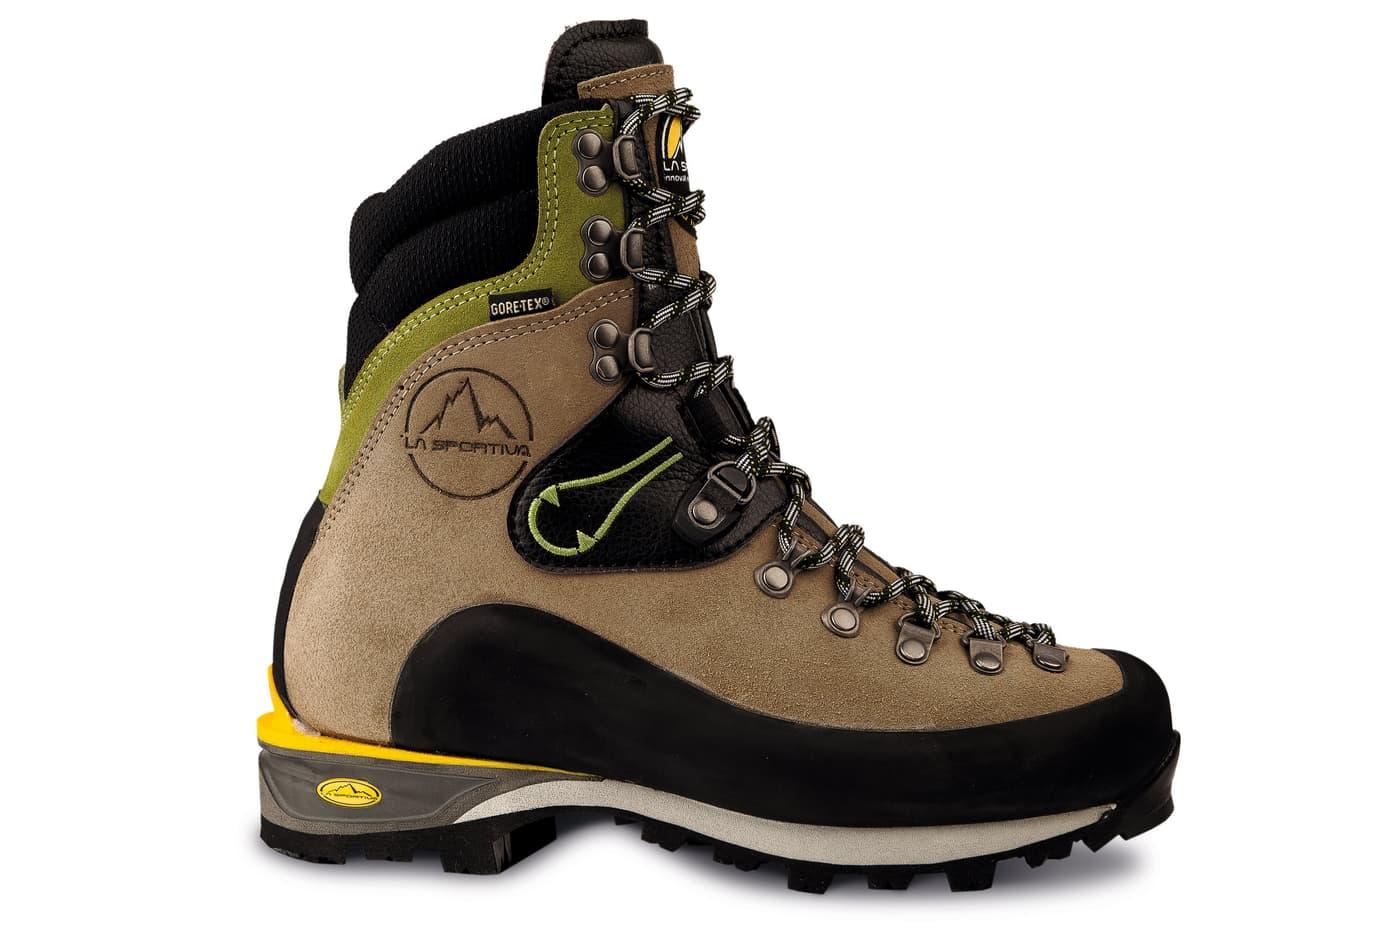 high quality special section popular brand La Sportiva KARAKORUM HC Chaussures de montagne pour femme